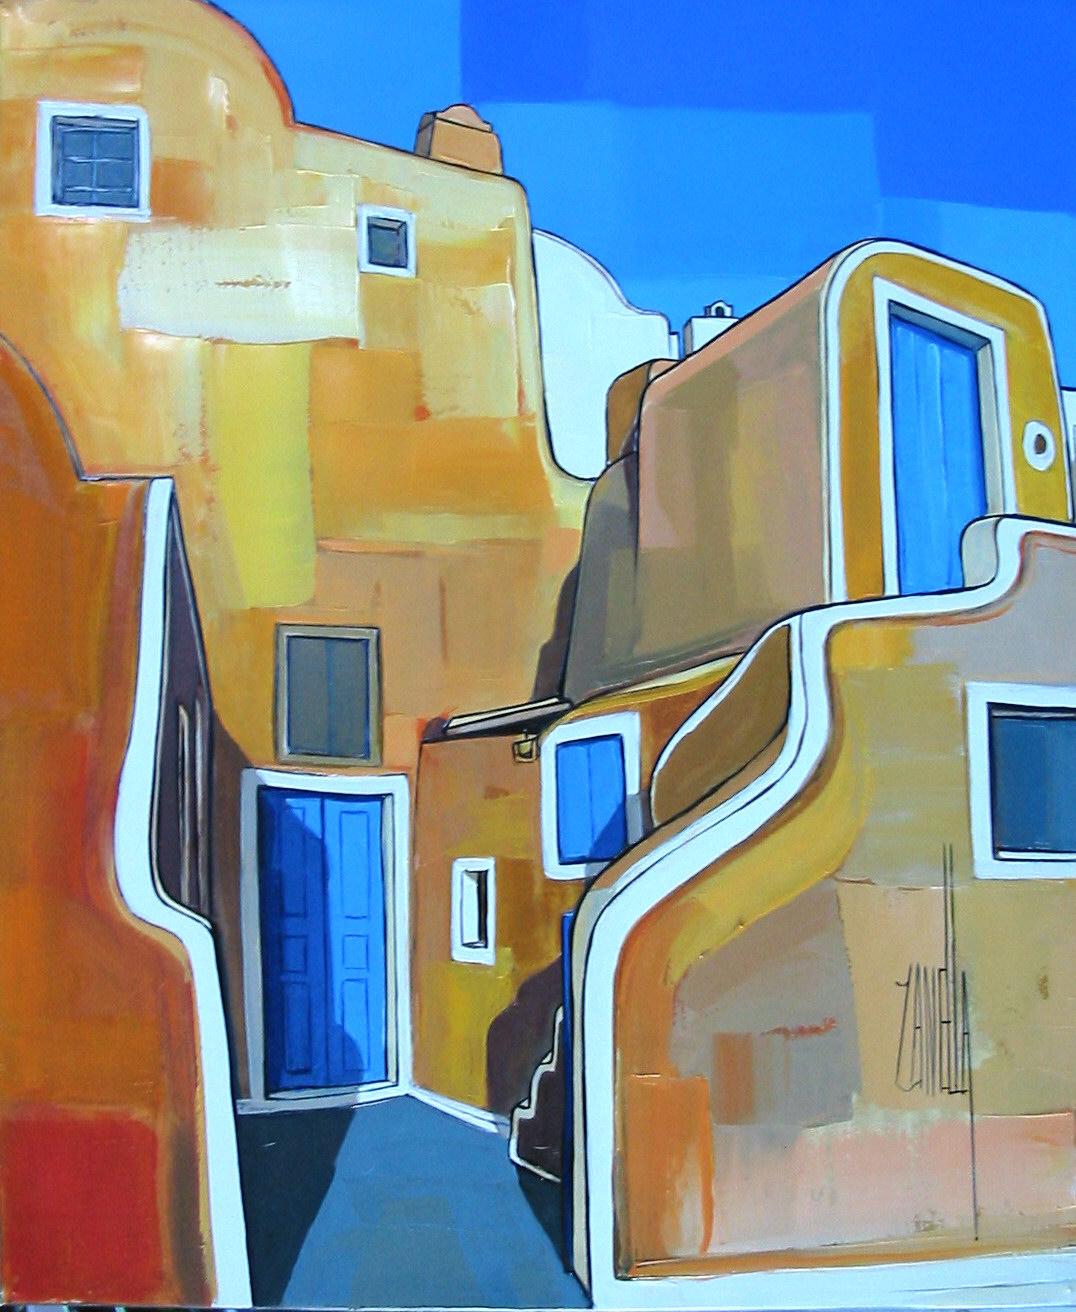 2005-OIA-La Maison Jaune-Santorin-8F